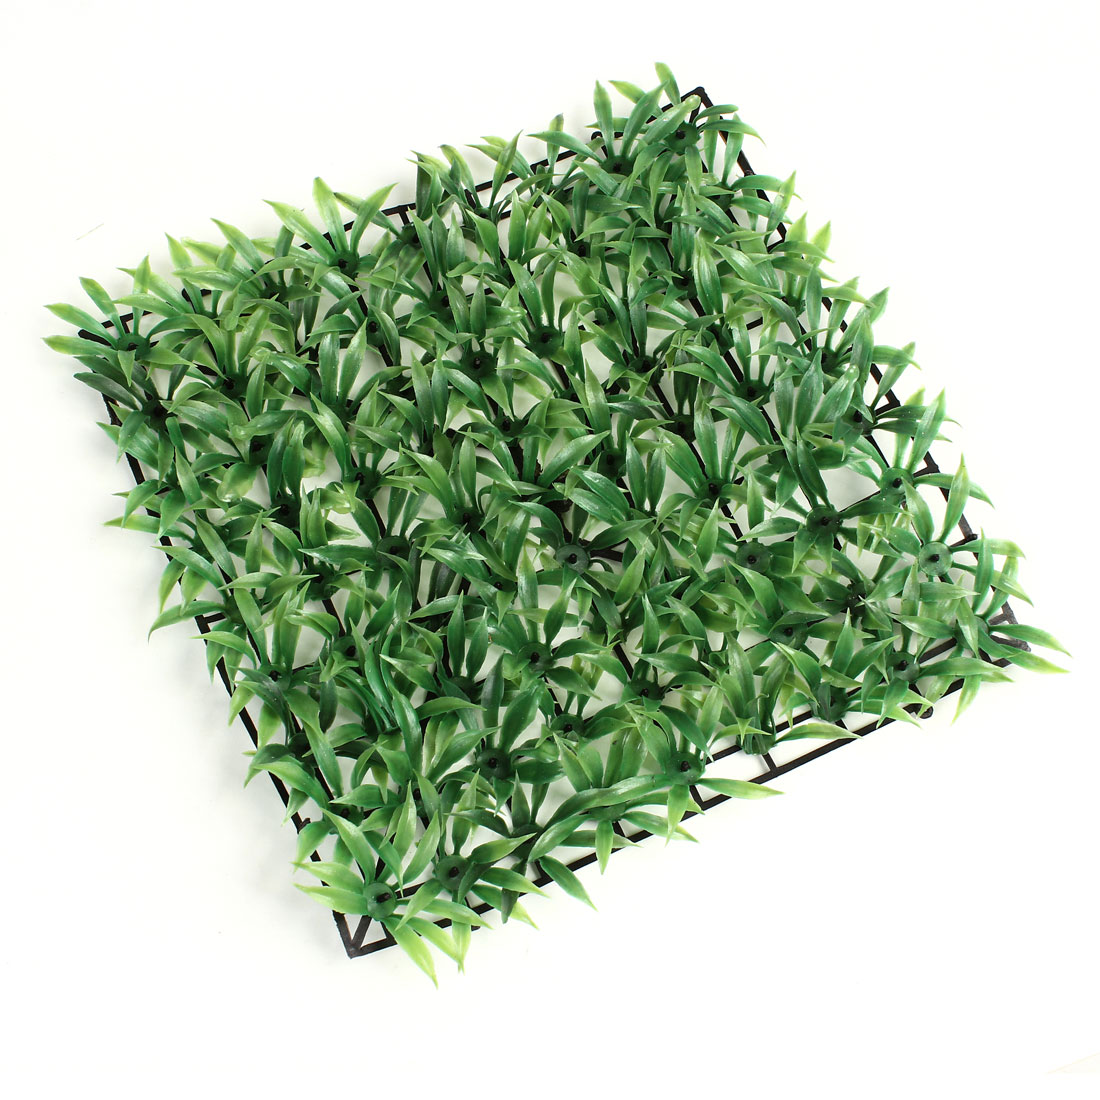 "9.8"" x 9.8"" Plastic Base Artificial Green Plastic Lawn Grass for Aquarium"